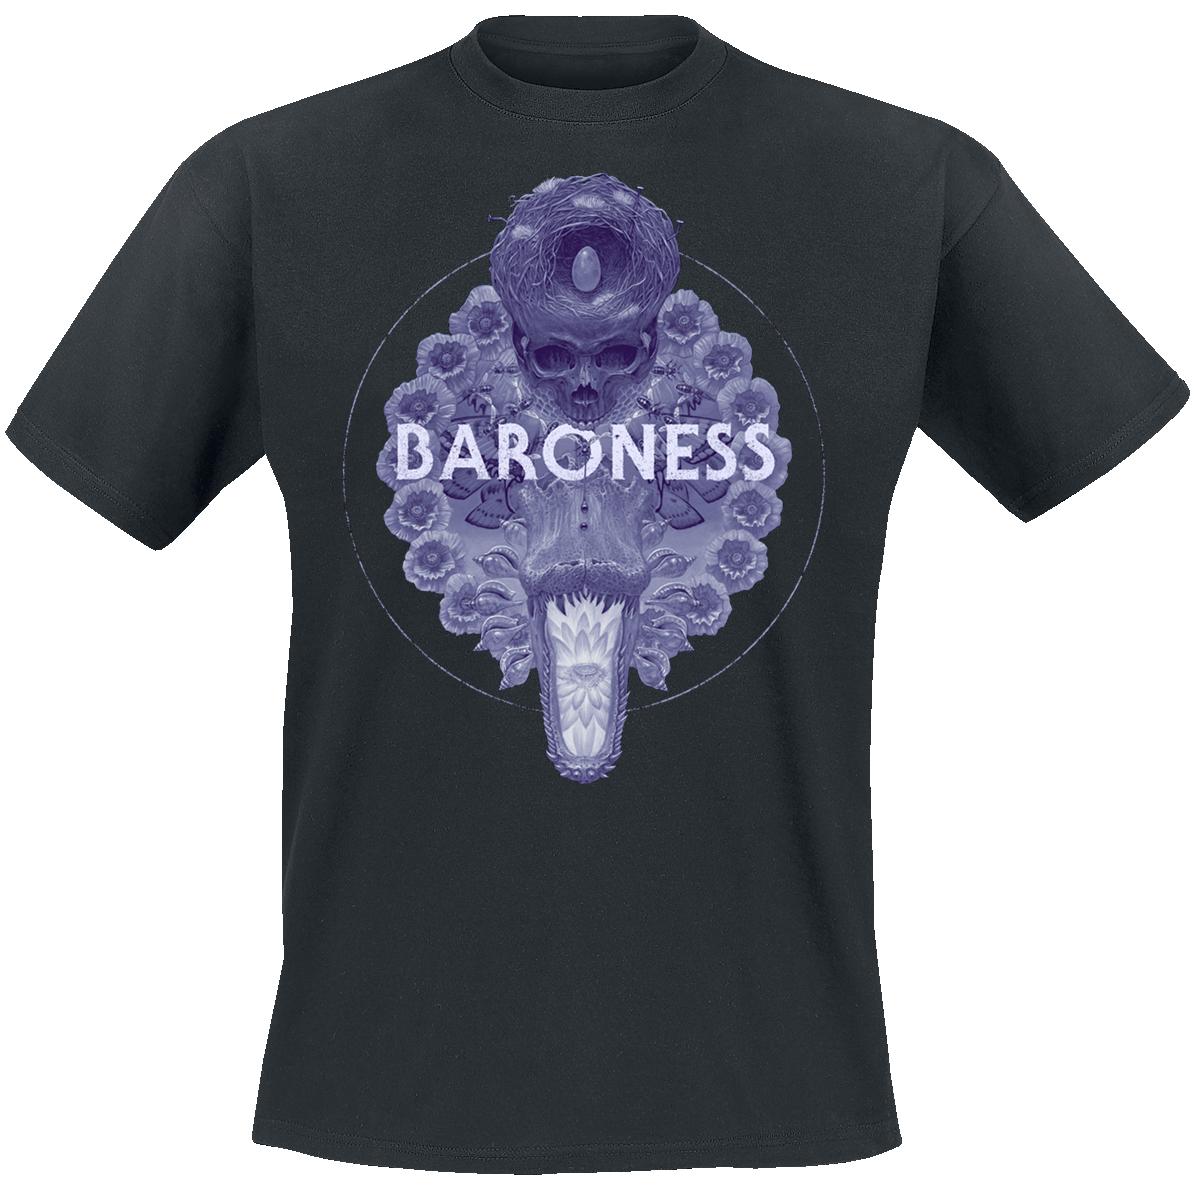 Baroness - Marald Gator - T-Shirt - black image